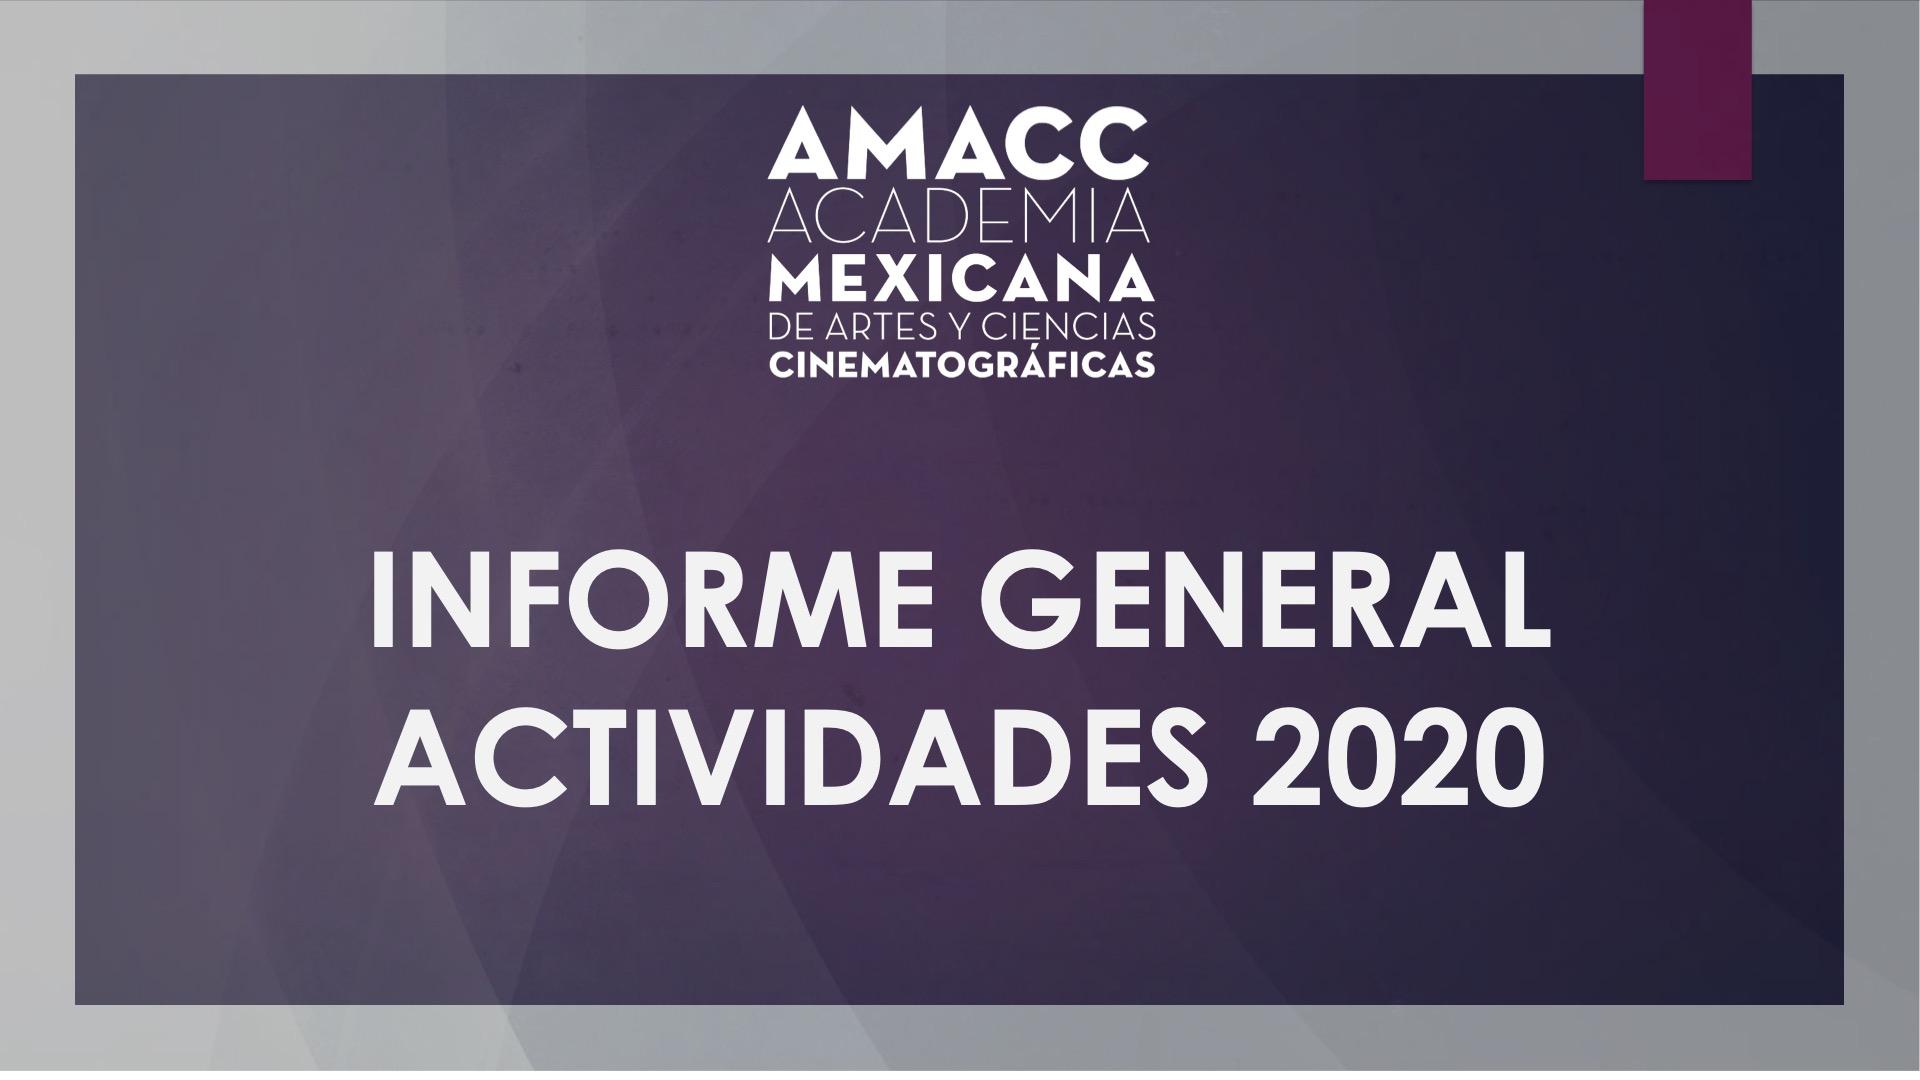 INFORME GENERAL DE ACTIVIDADES 2020